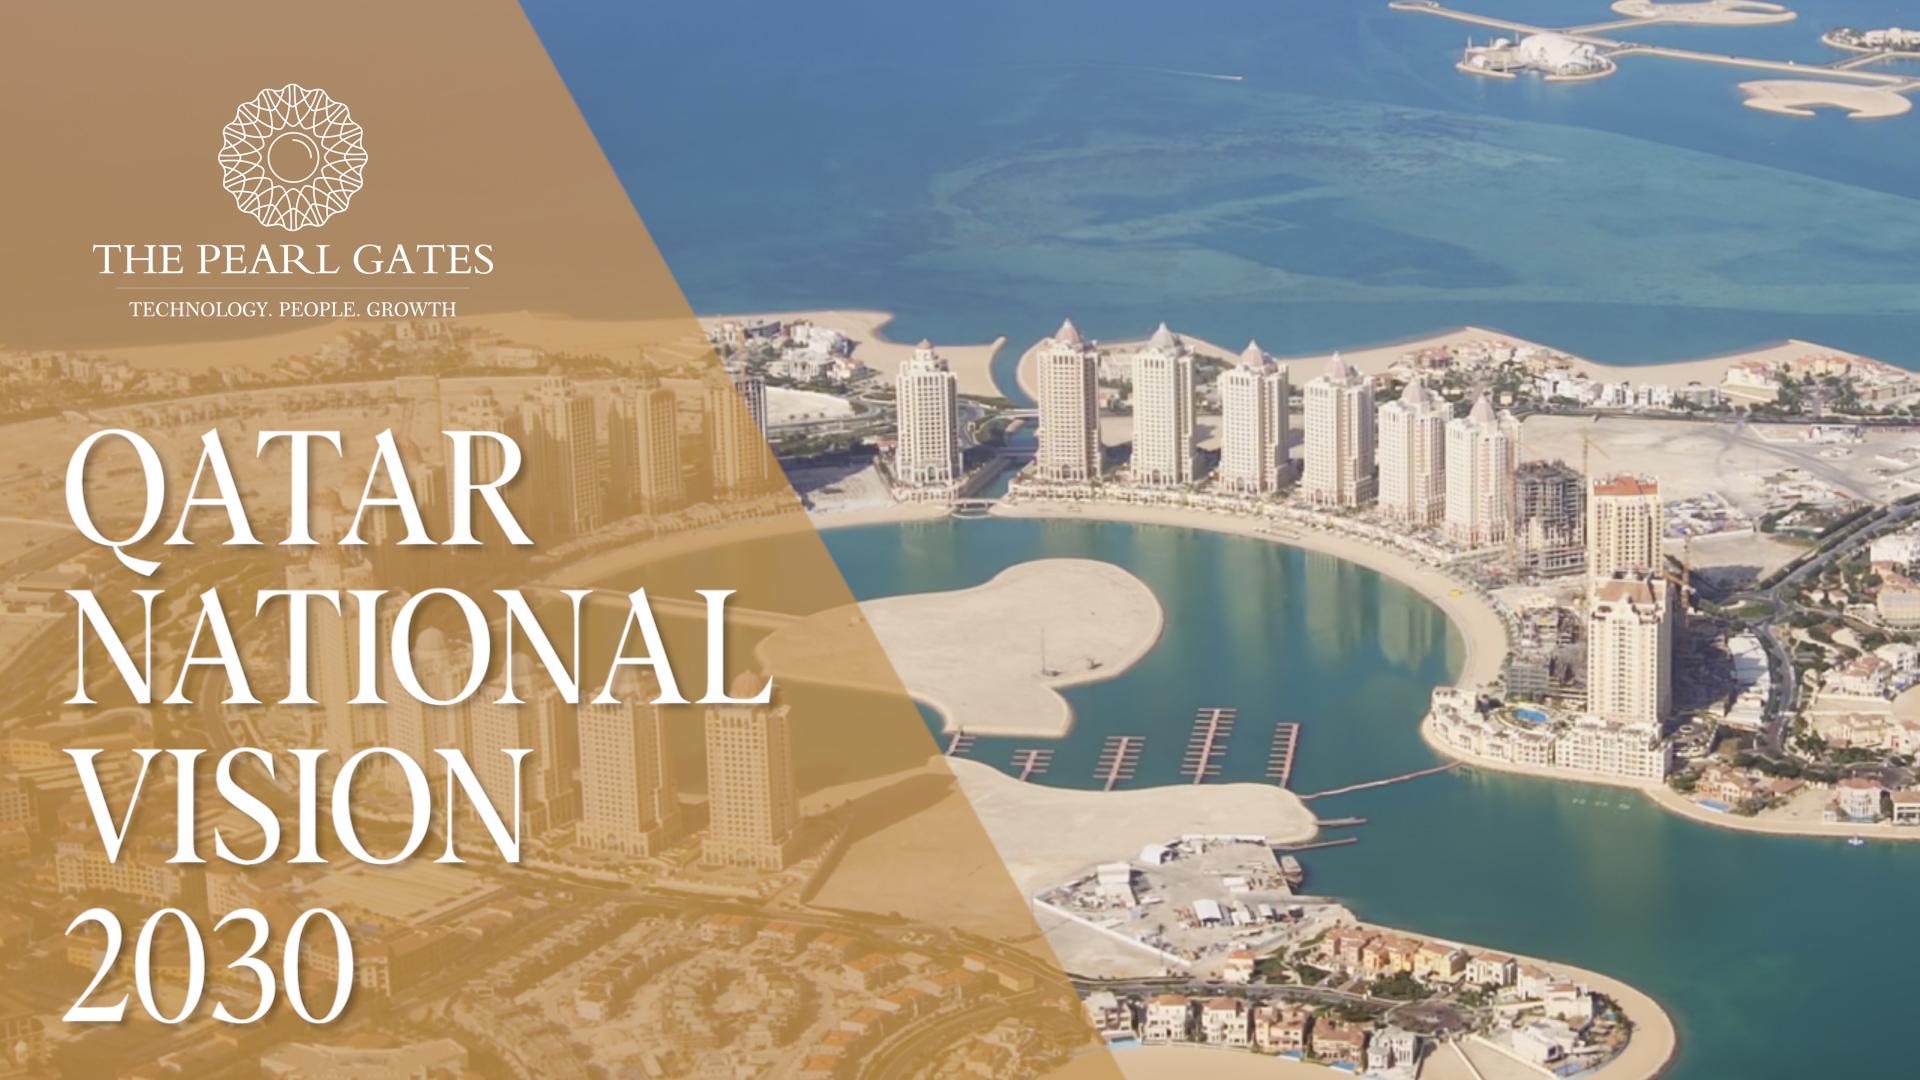 Qatar Natioanl Vision 2030